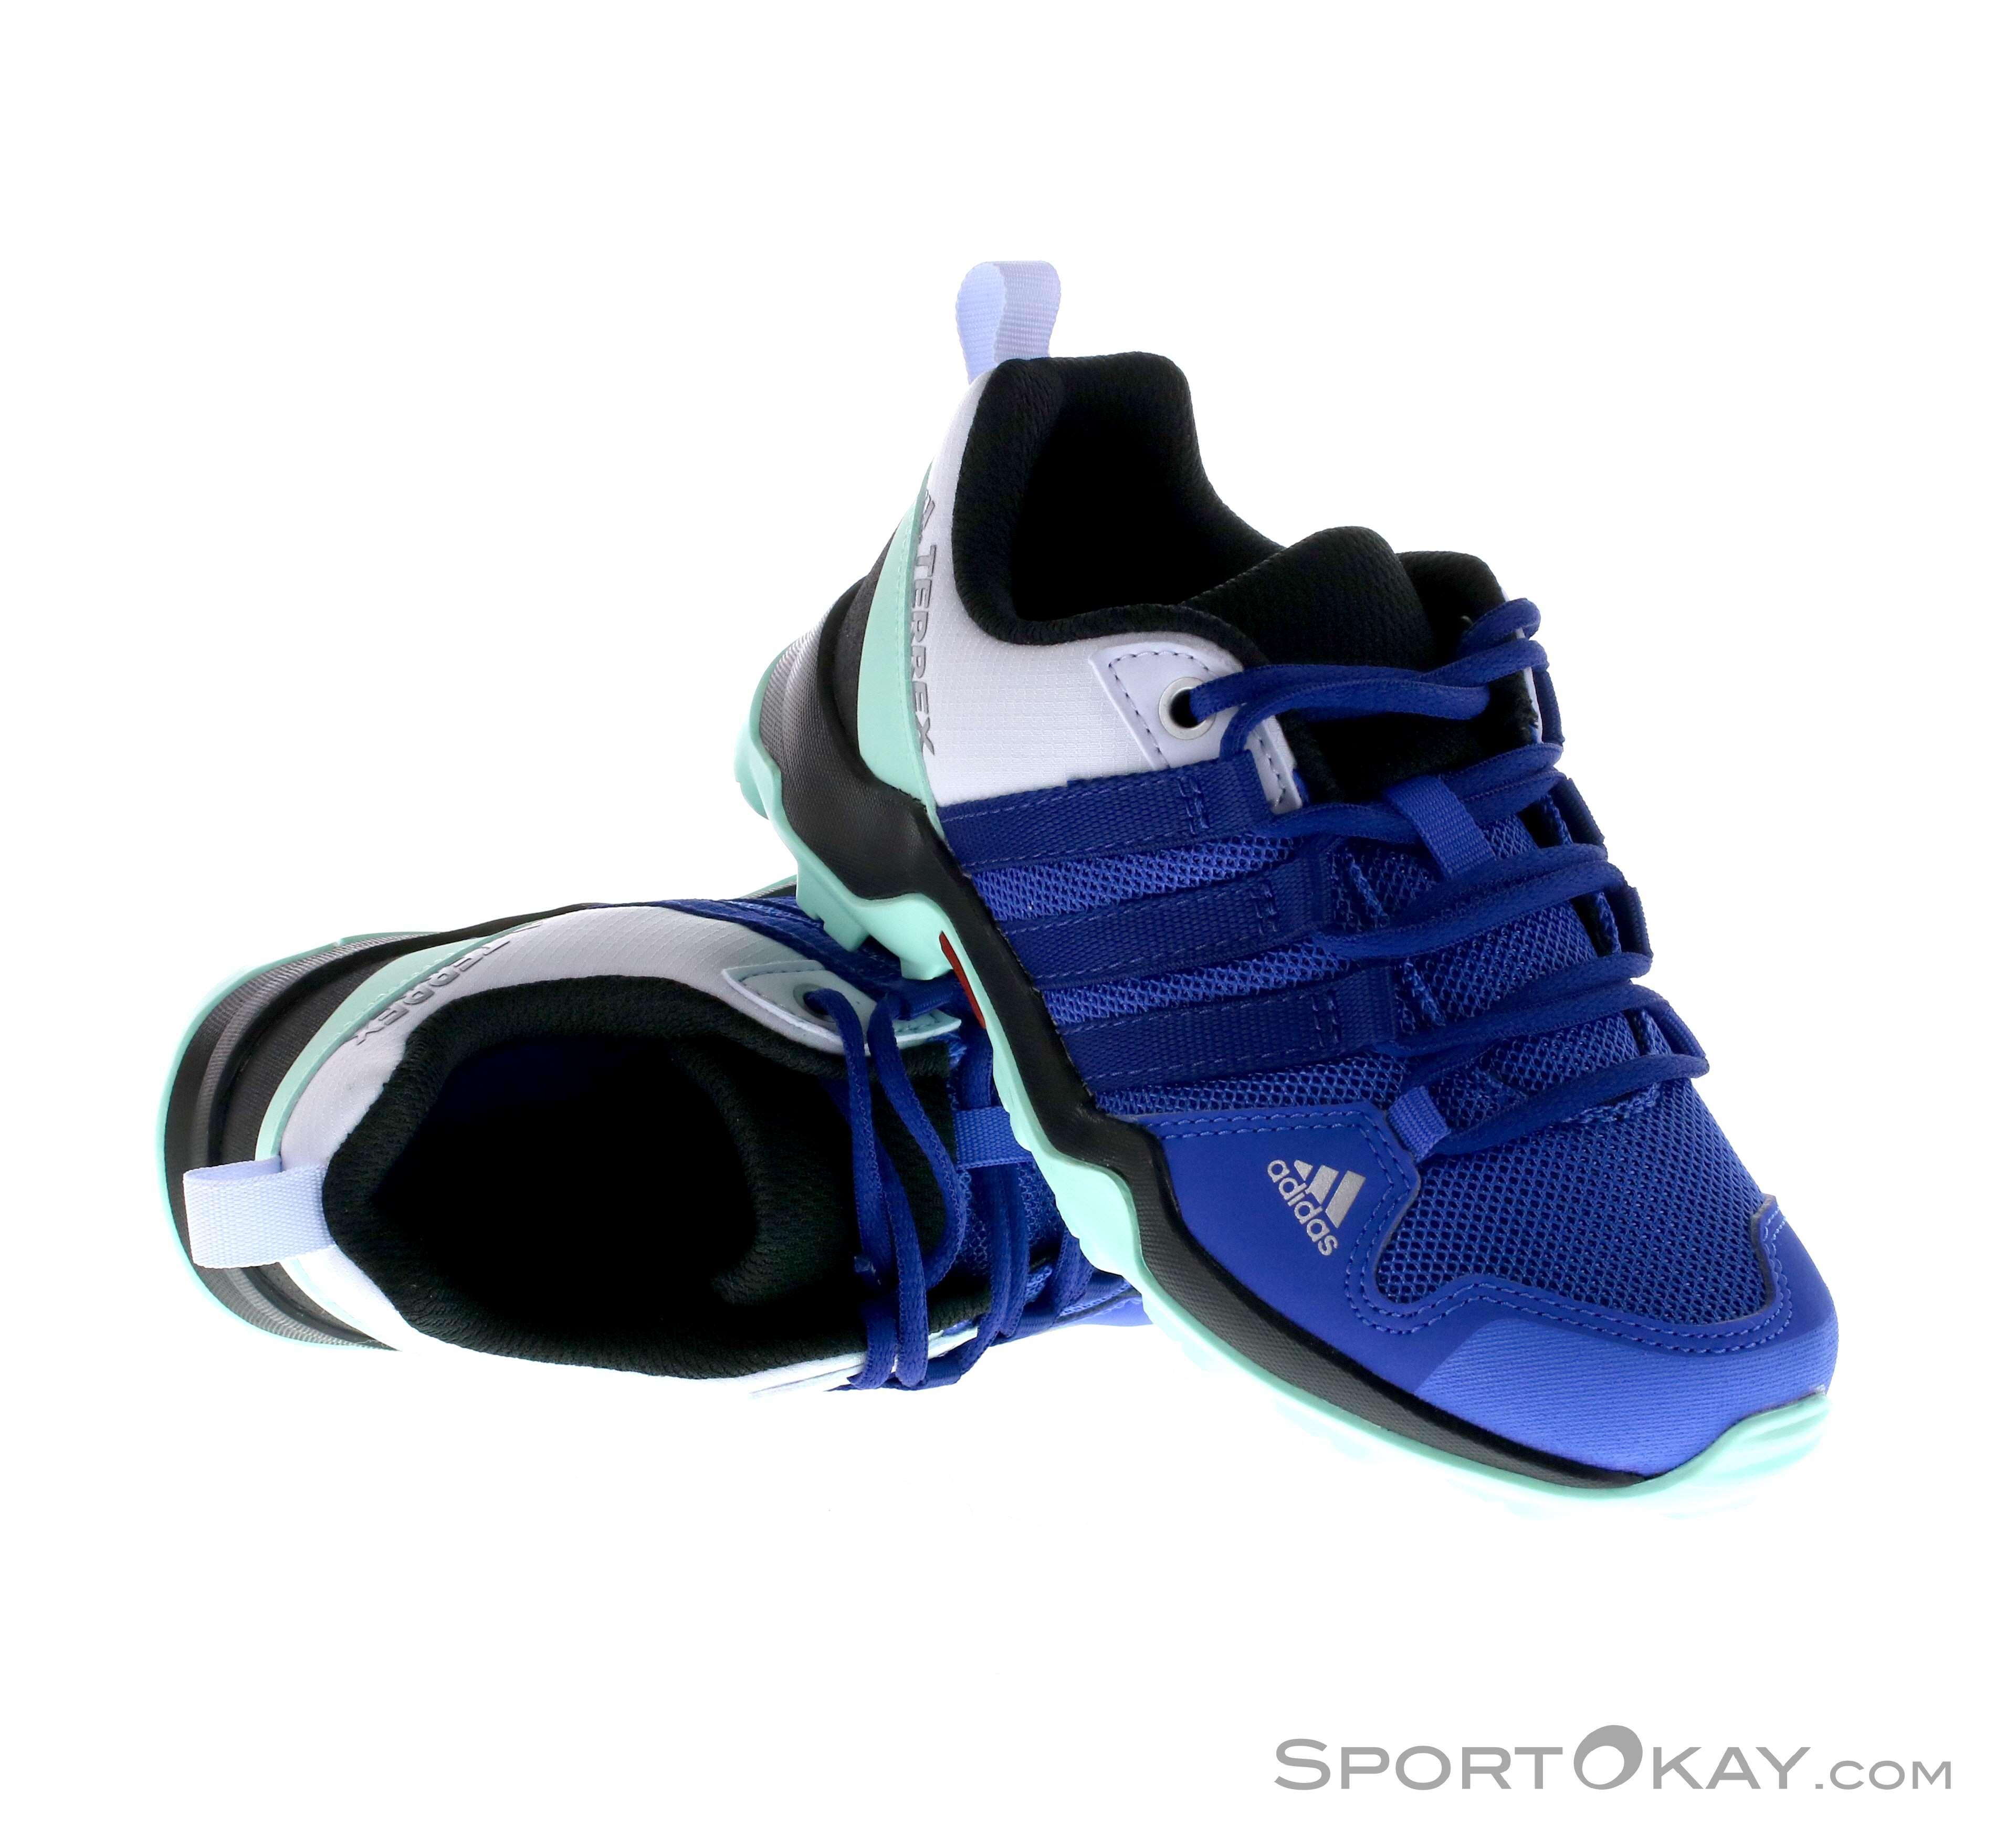 Ax2r Scarpe Adidas Bambini Da Trail Terrex Running yvYbfg76